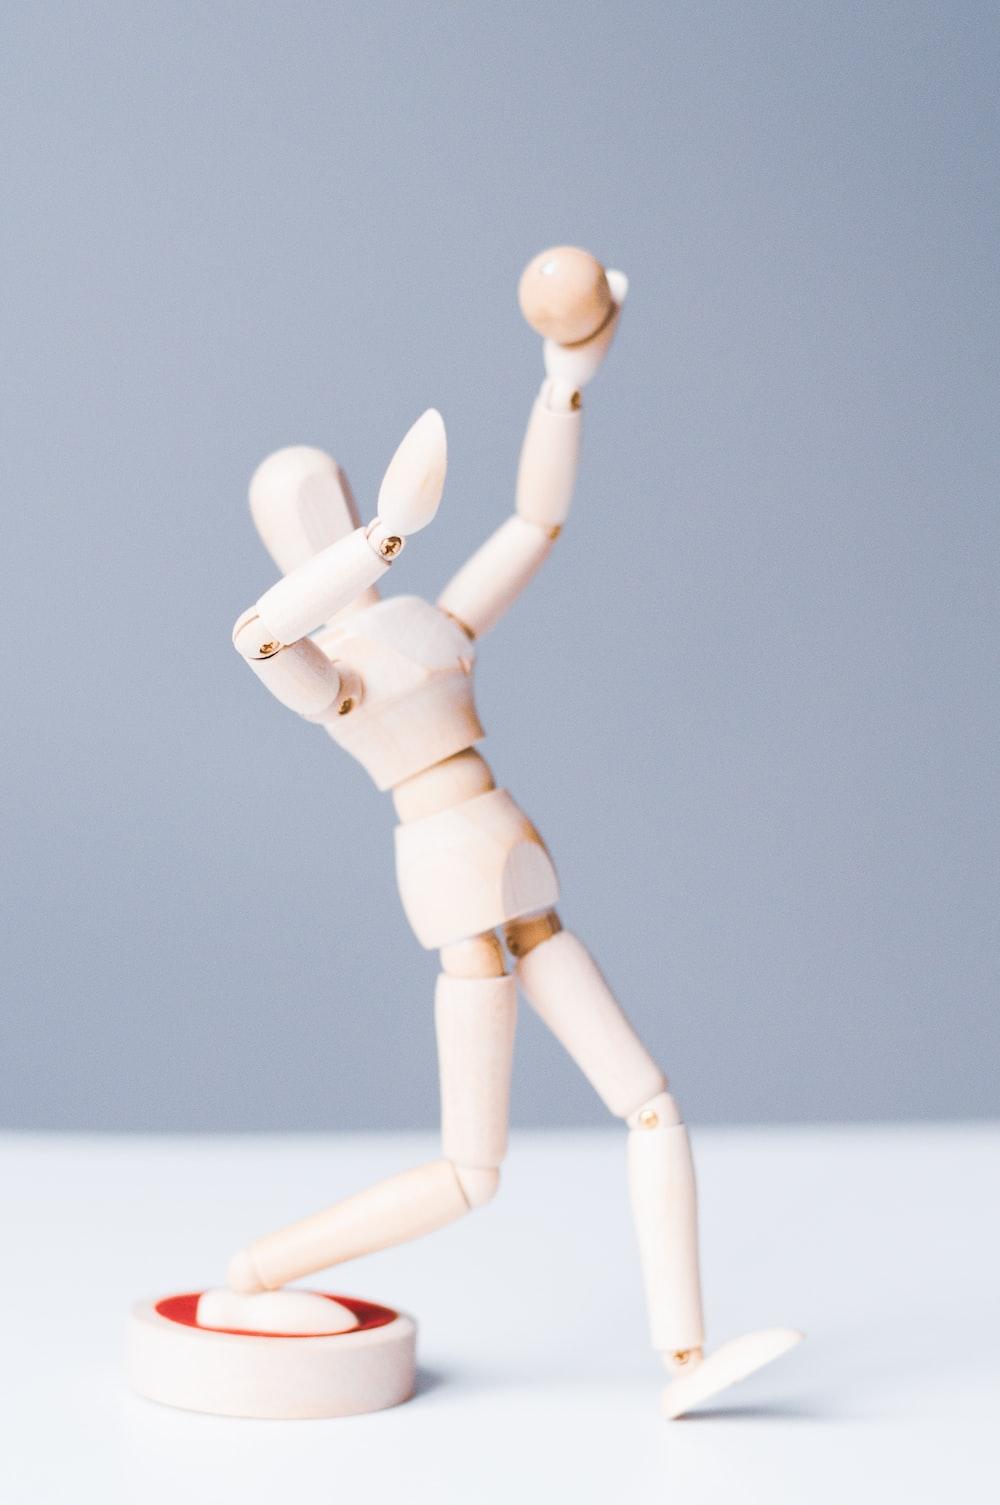 brown manikin figure on white surface